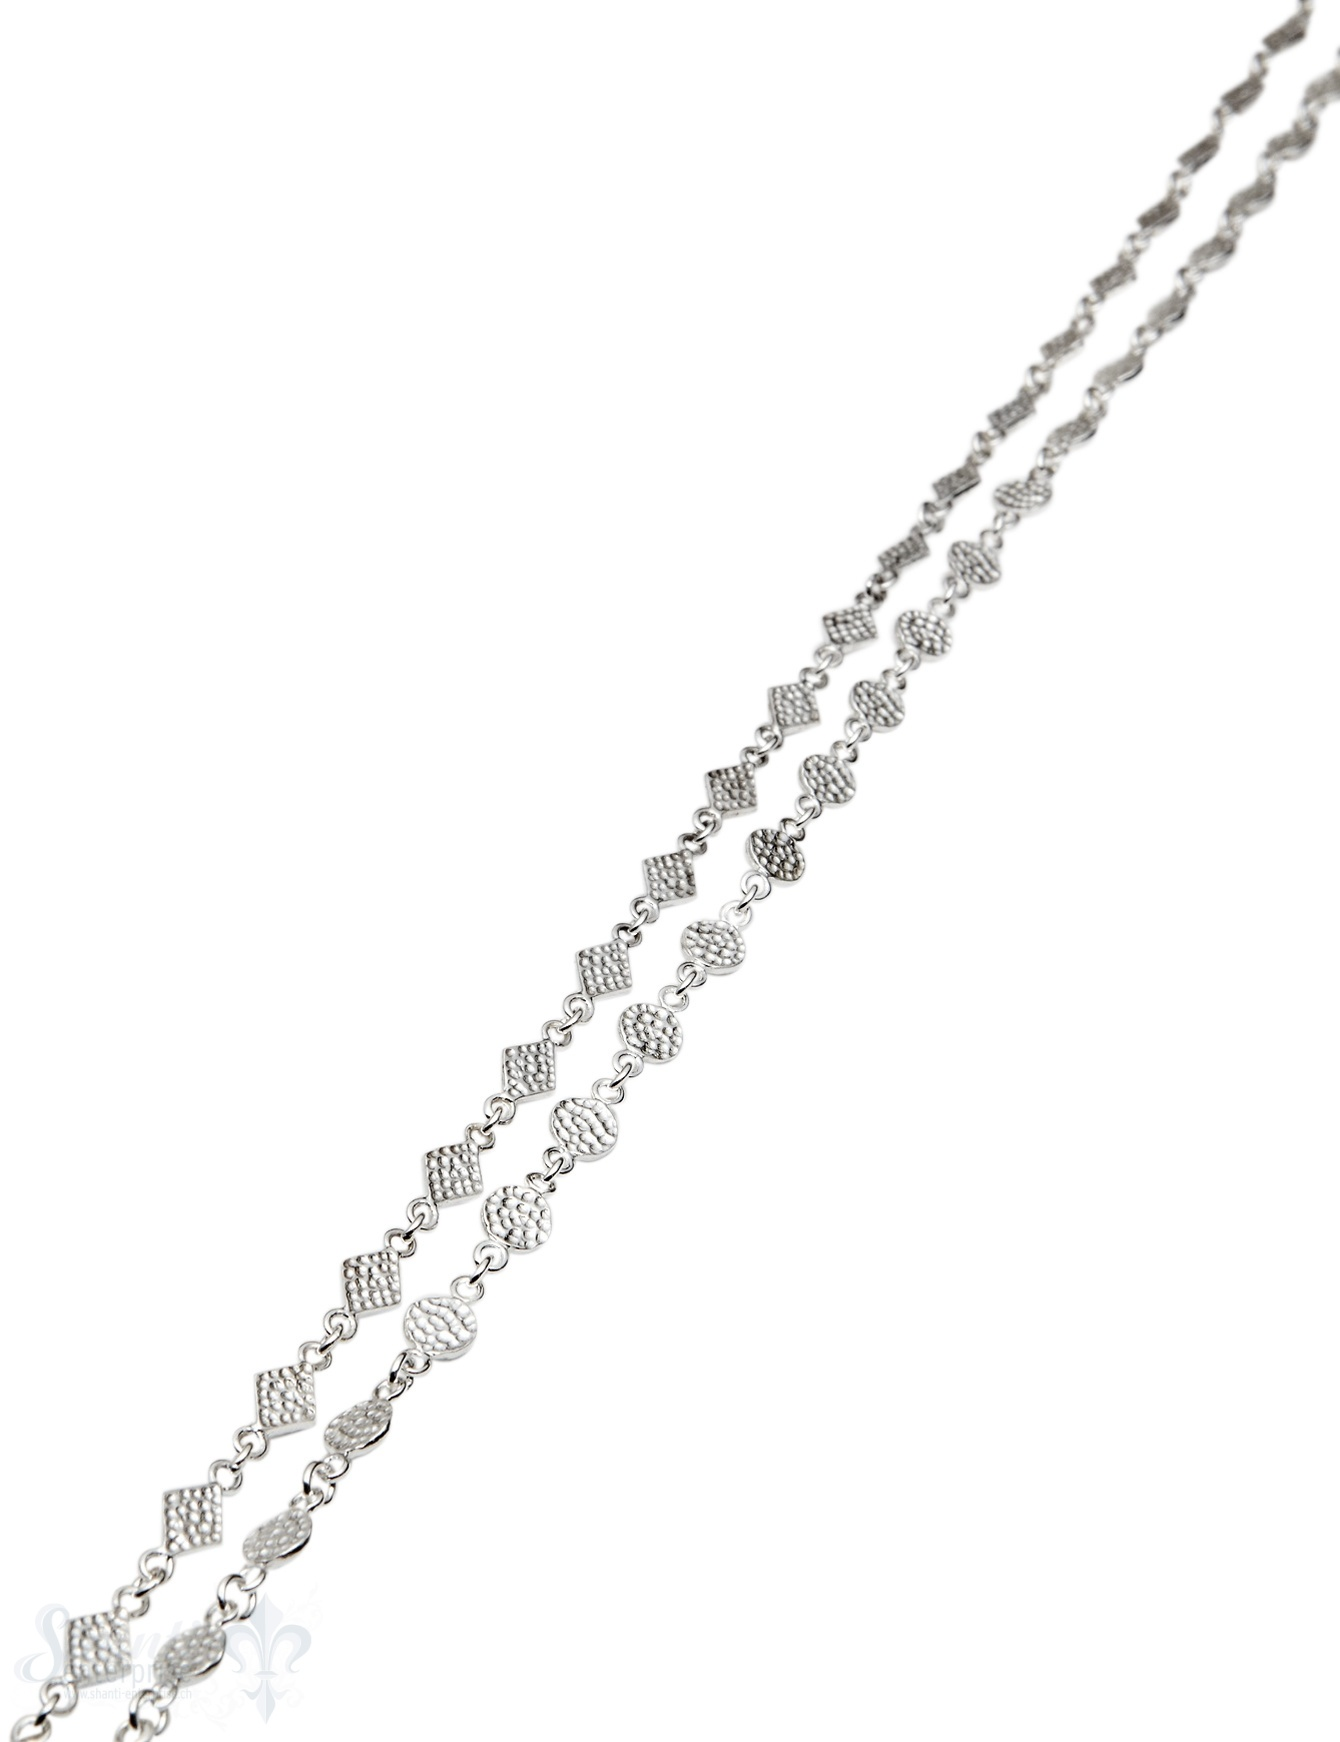 Silberkette Plättli rund fein gehämmert (Abschnittlänge wird angepasst) per cm